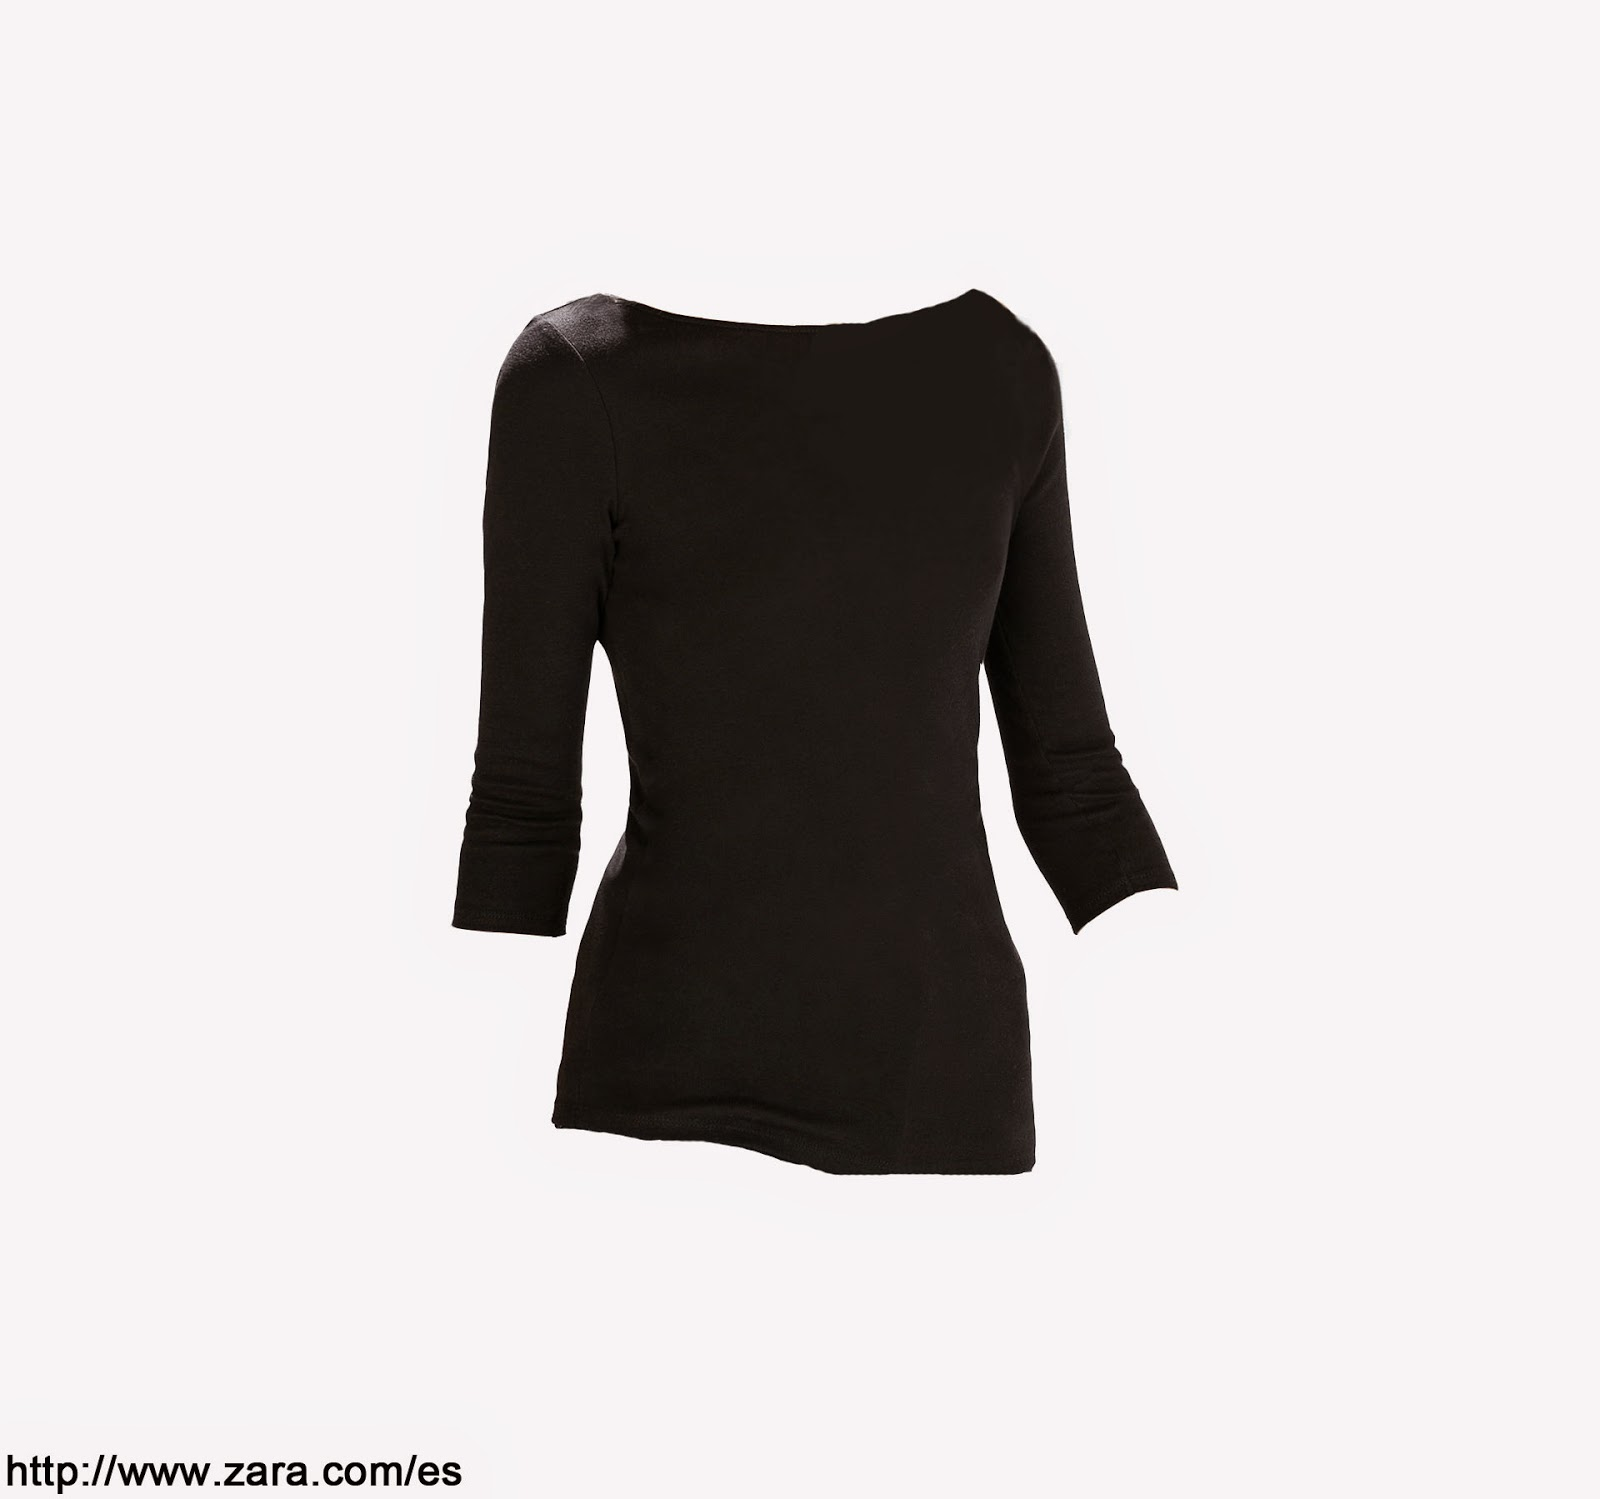 Camiseta/T-shirt: ZARA